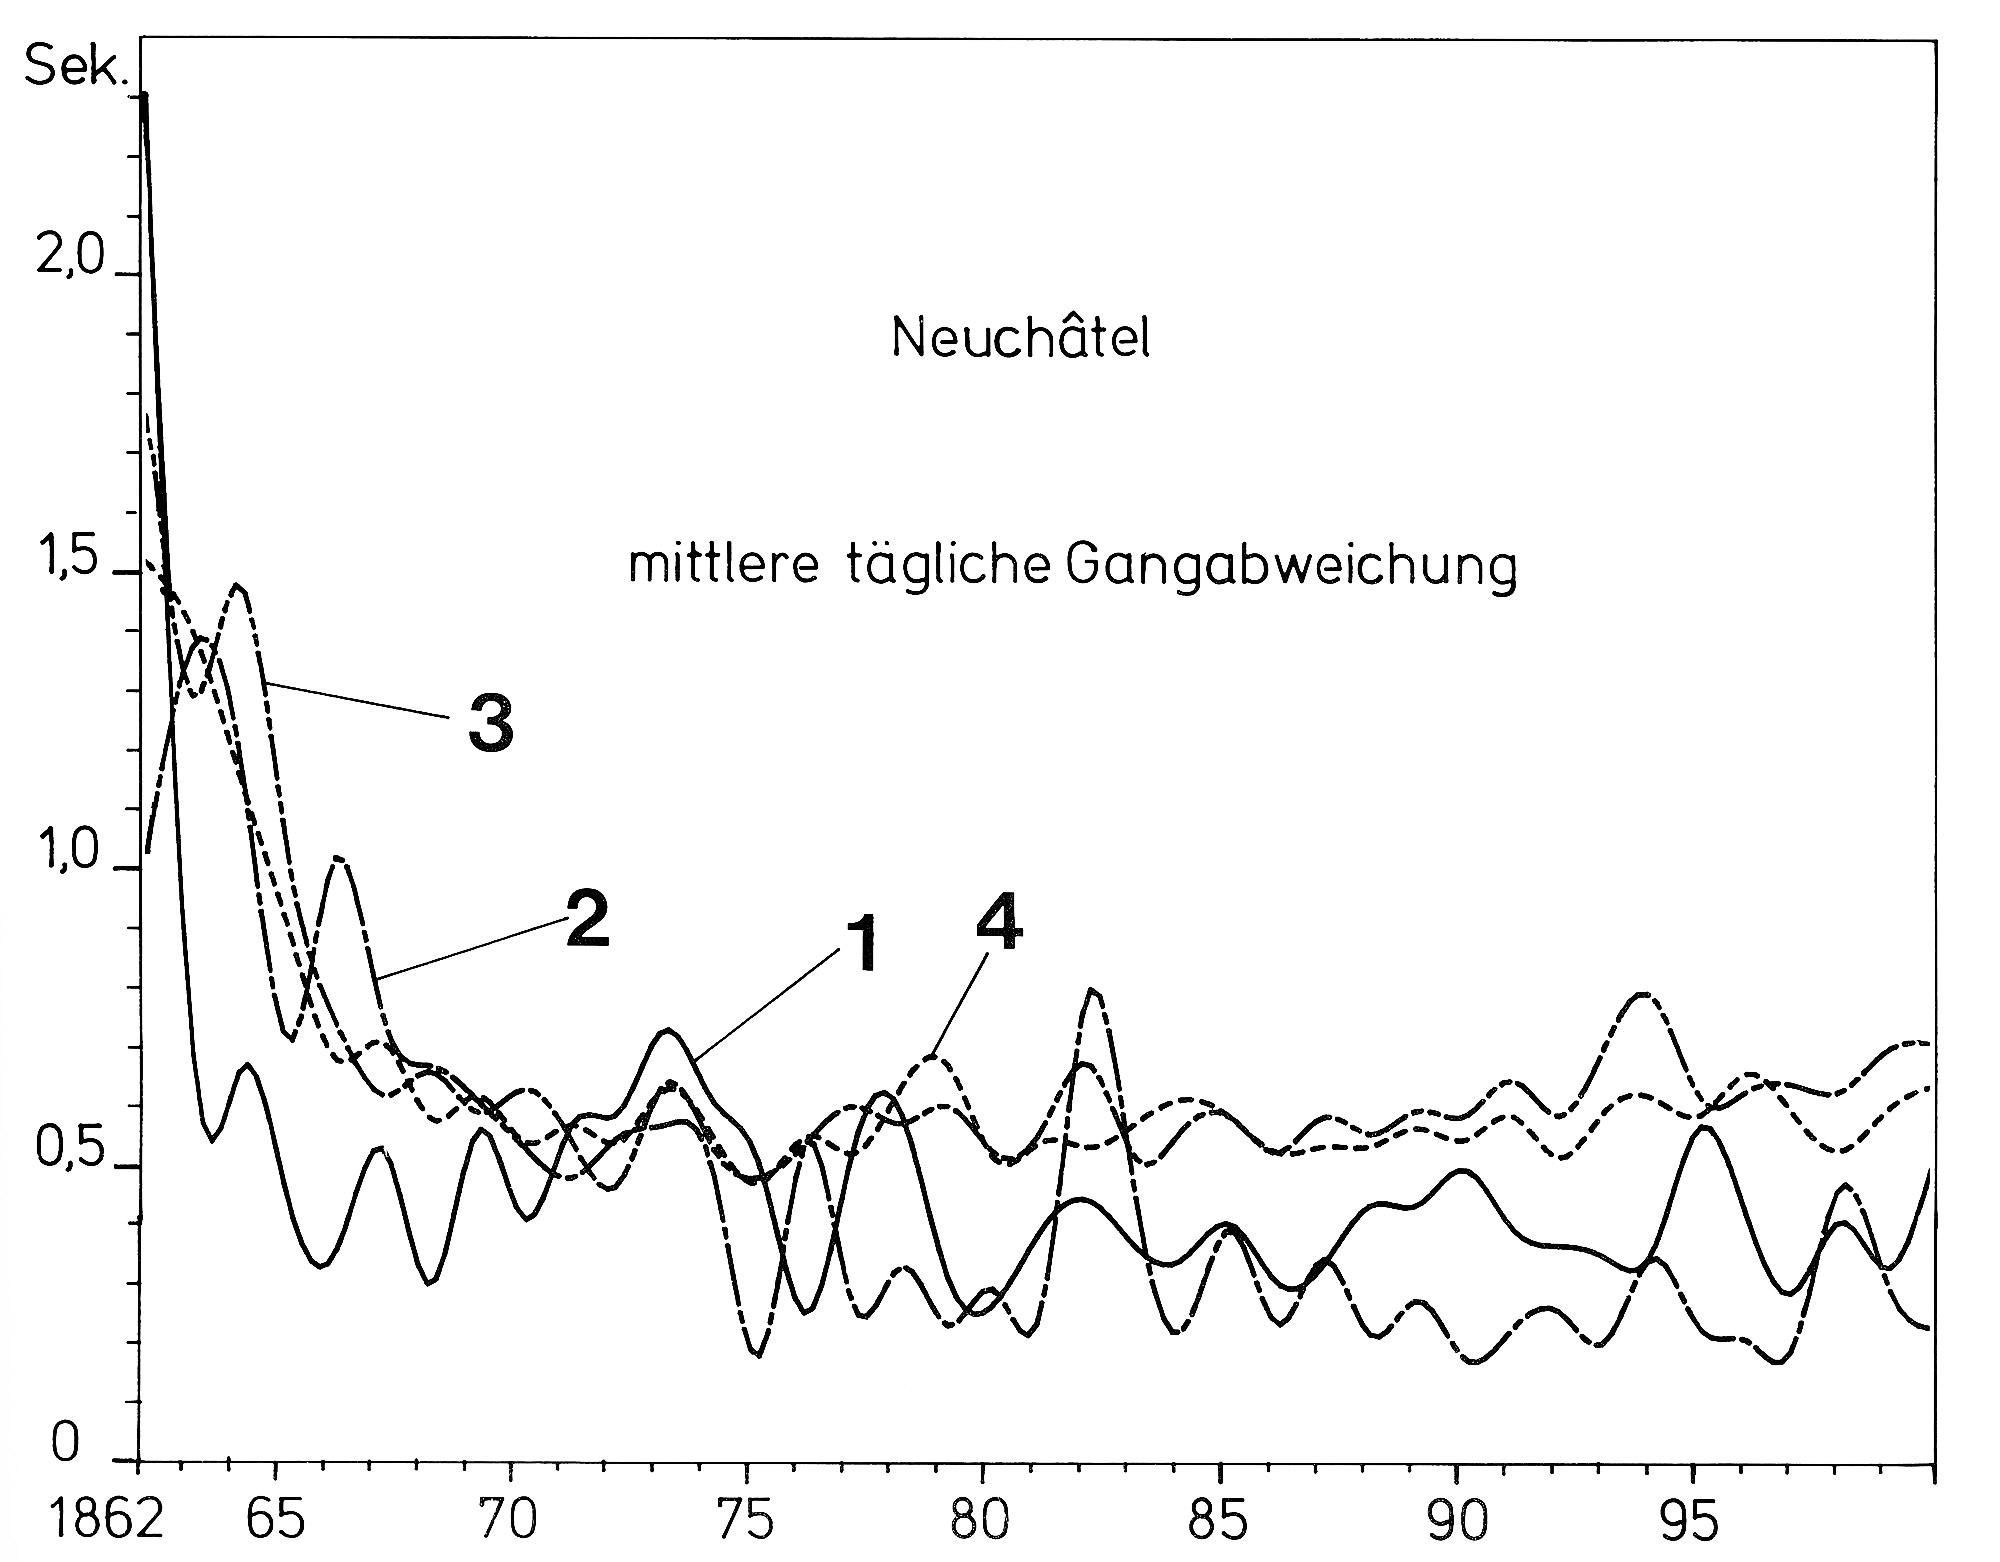 Timekeeping Average Daily Rate Observatory Neuchatel (Reinhard Meis)